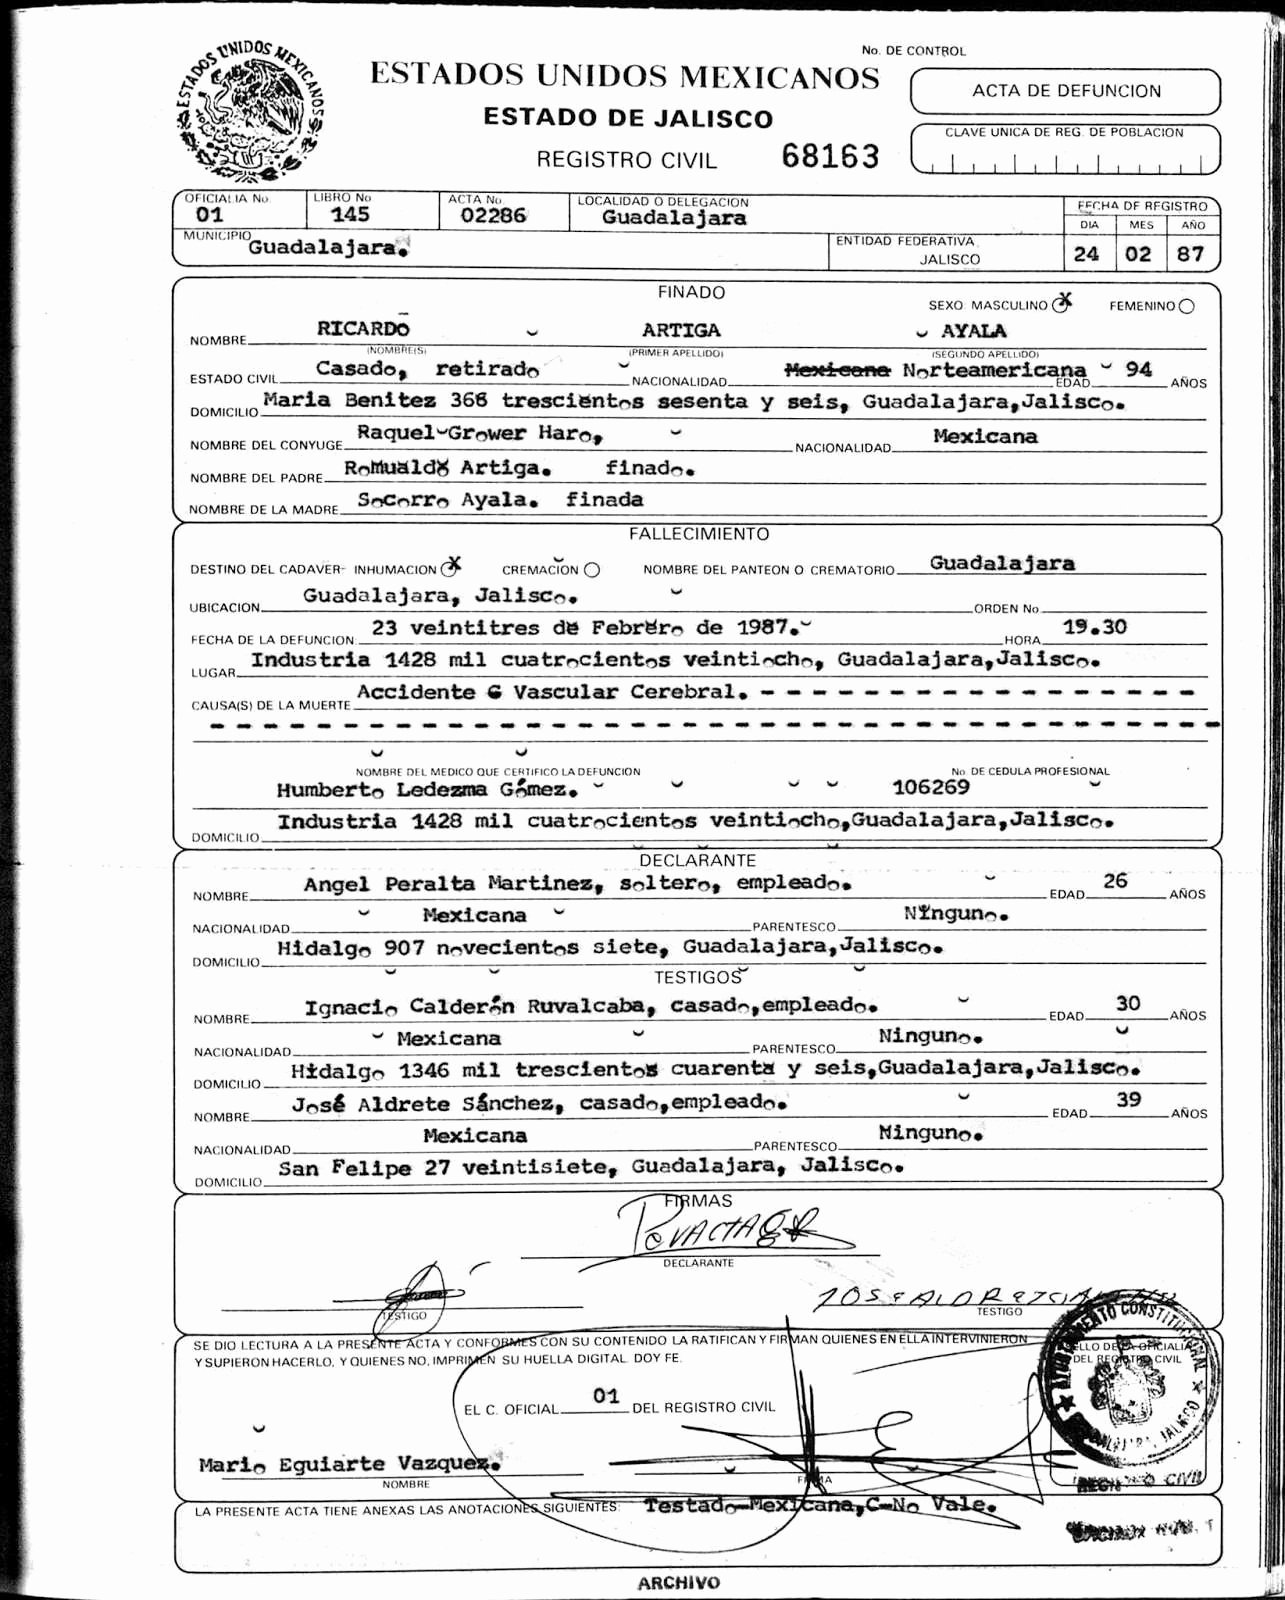 Mexican Birth Certificate Translation Template Inspirational El Salvador Birth Certificate Great El Salvador Birth